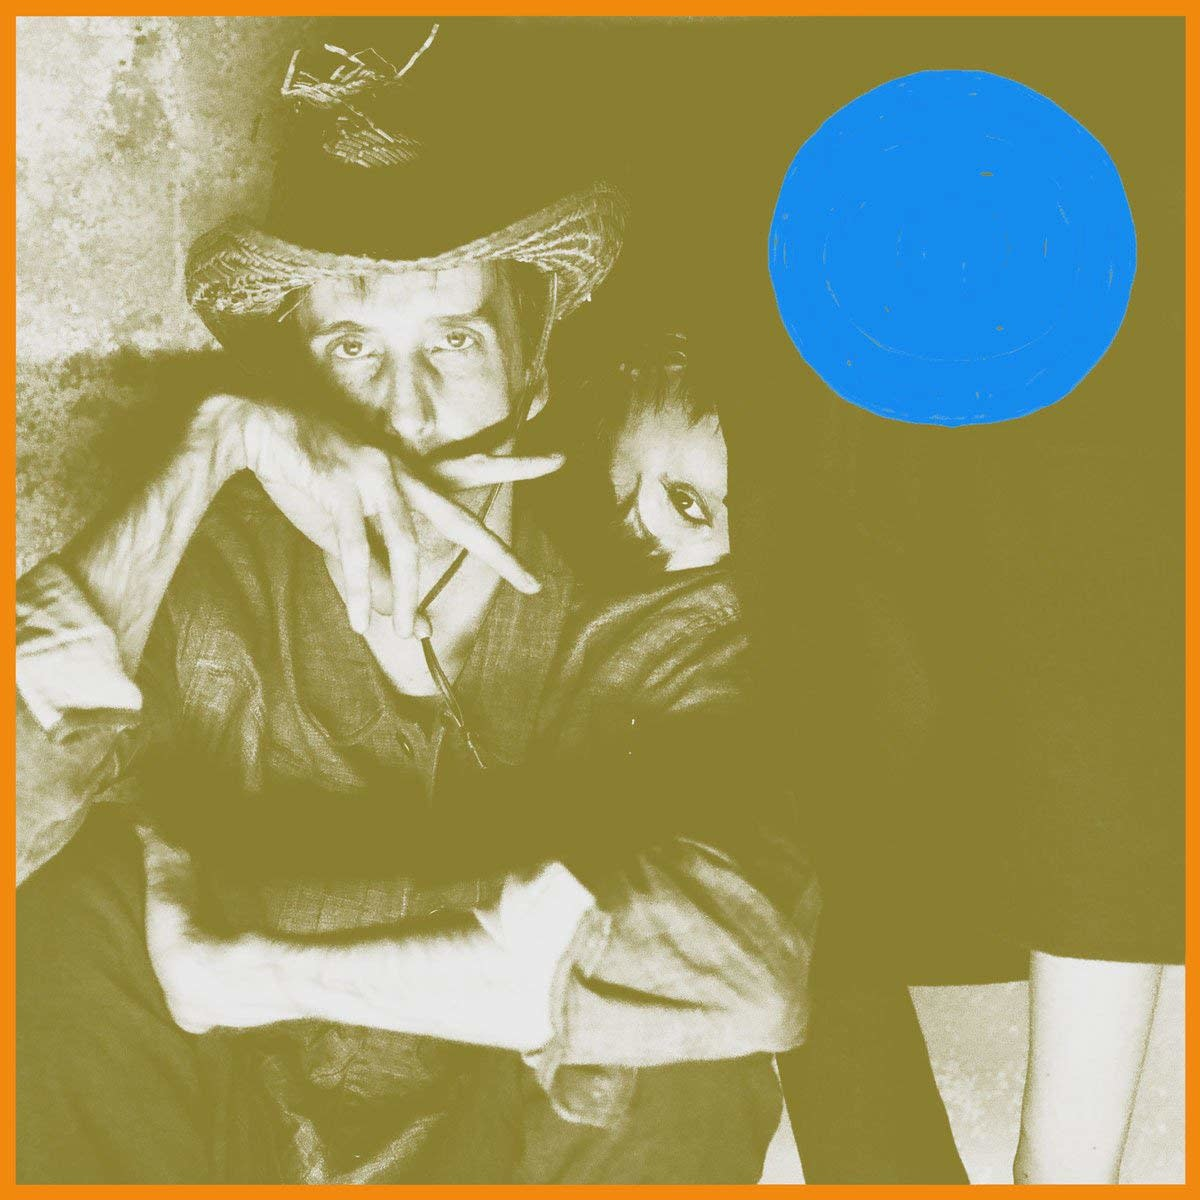 Cate Le Bon & Bradford Cox - Myths 004